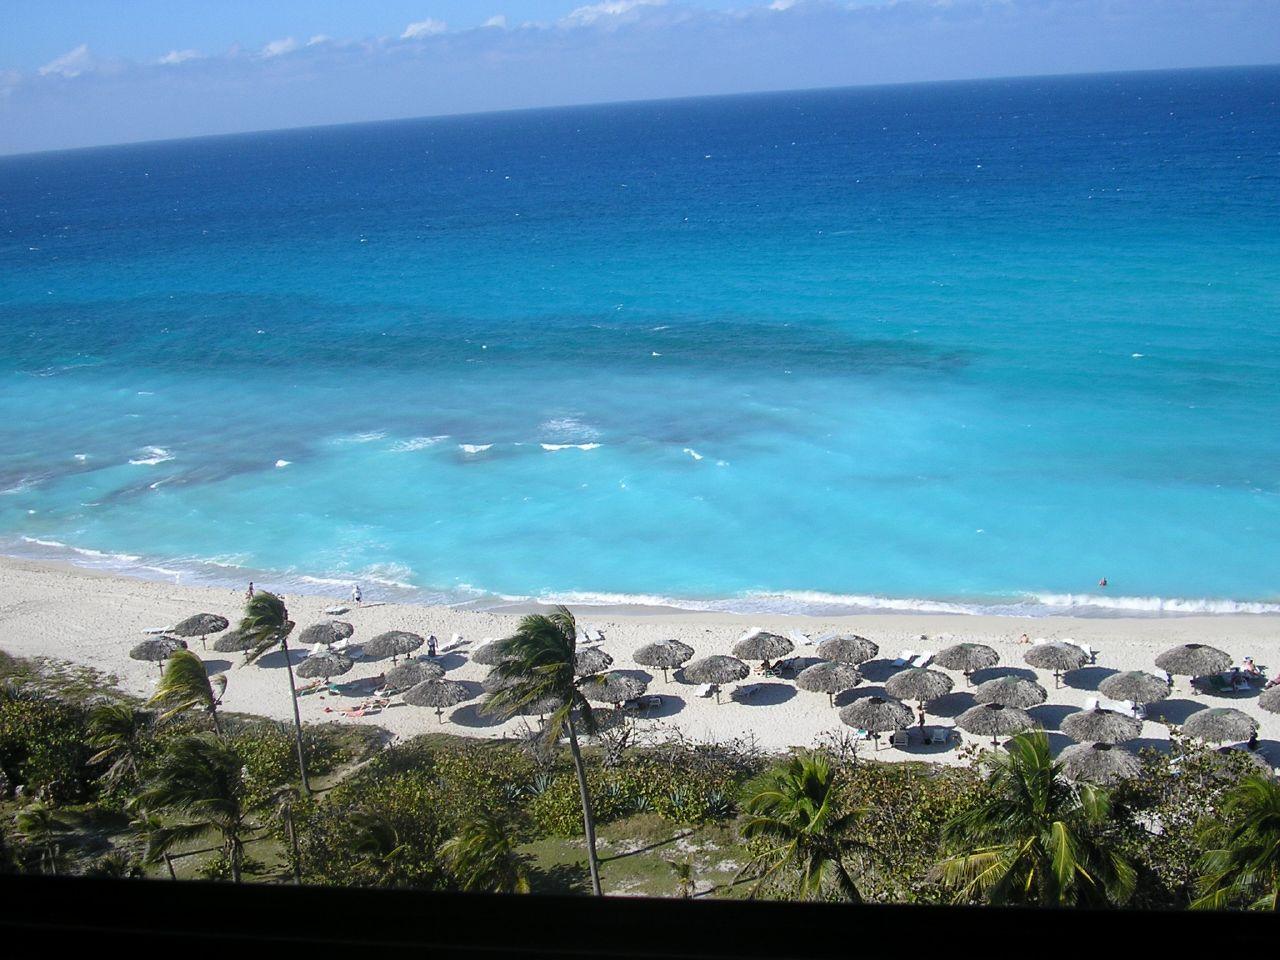 http://4.bp.blogspot.com/-vklCAC86fR0/TgDkLZ0GtLI/AAAAAAAAAiQ/iJ_PvRNfCk8/s1600/varadero+beach+%25285%2529.jpg